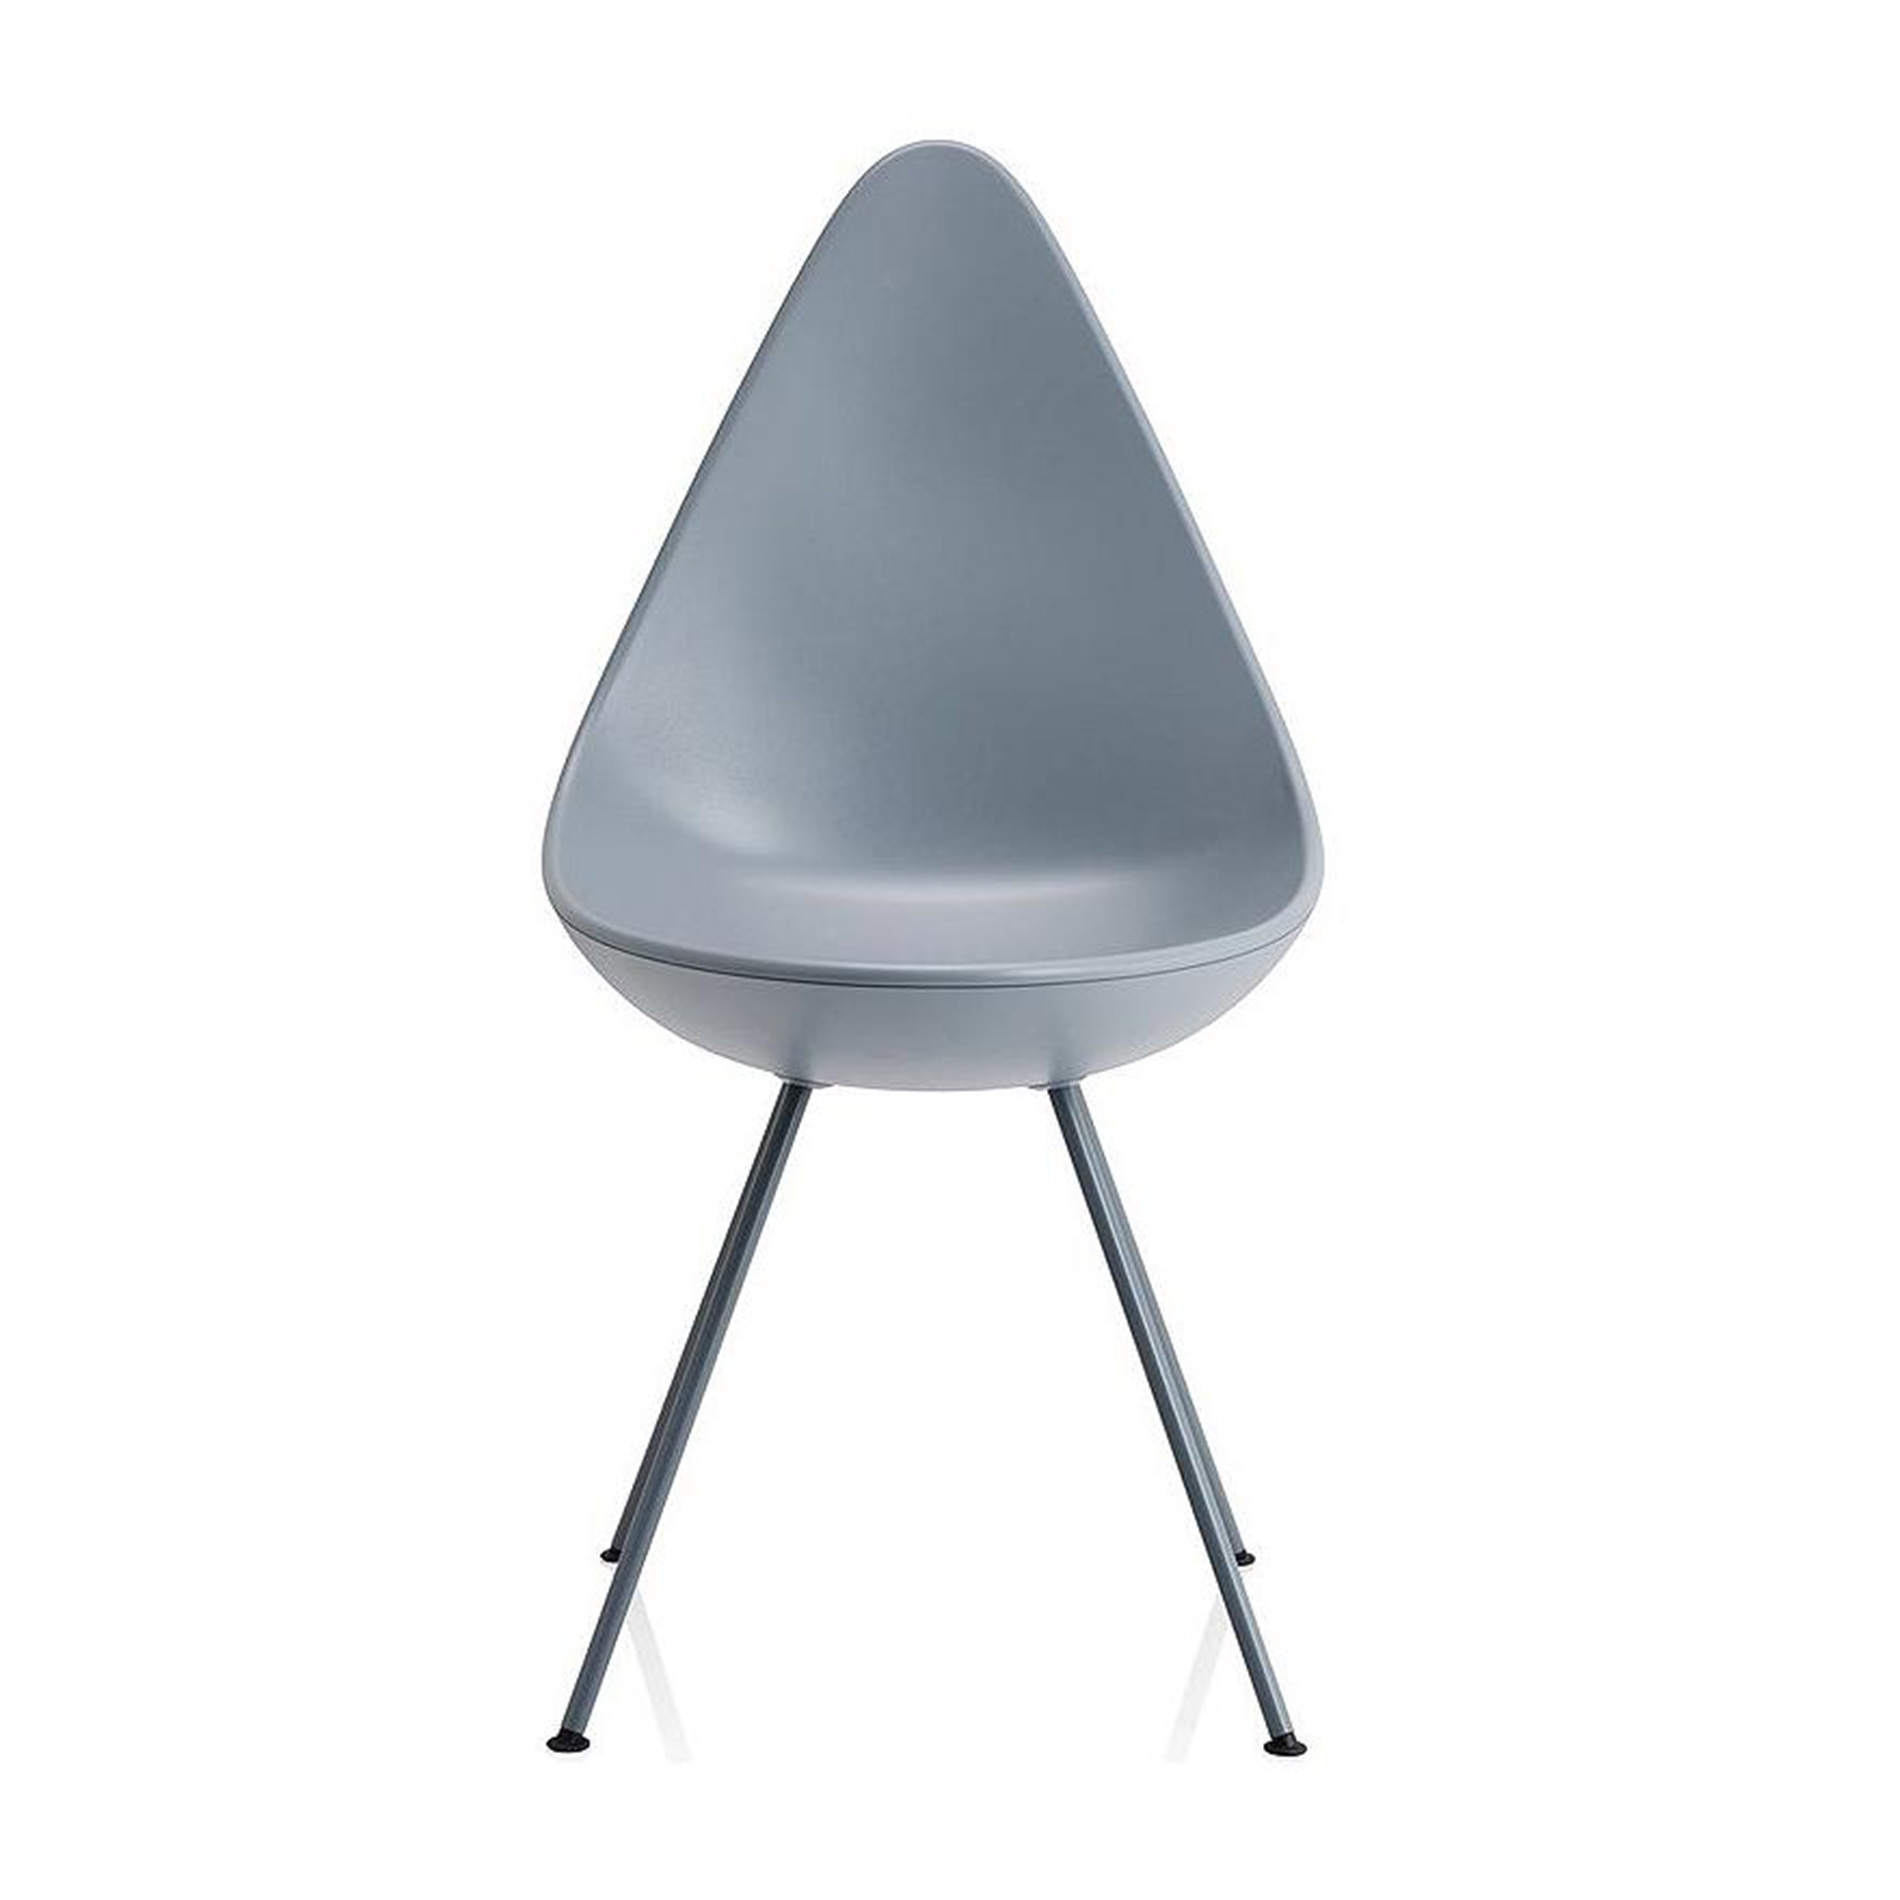 Drop Chair by Arne Jacobsen for Fritz Hansen